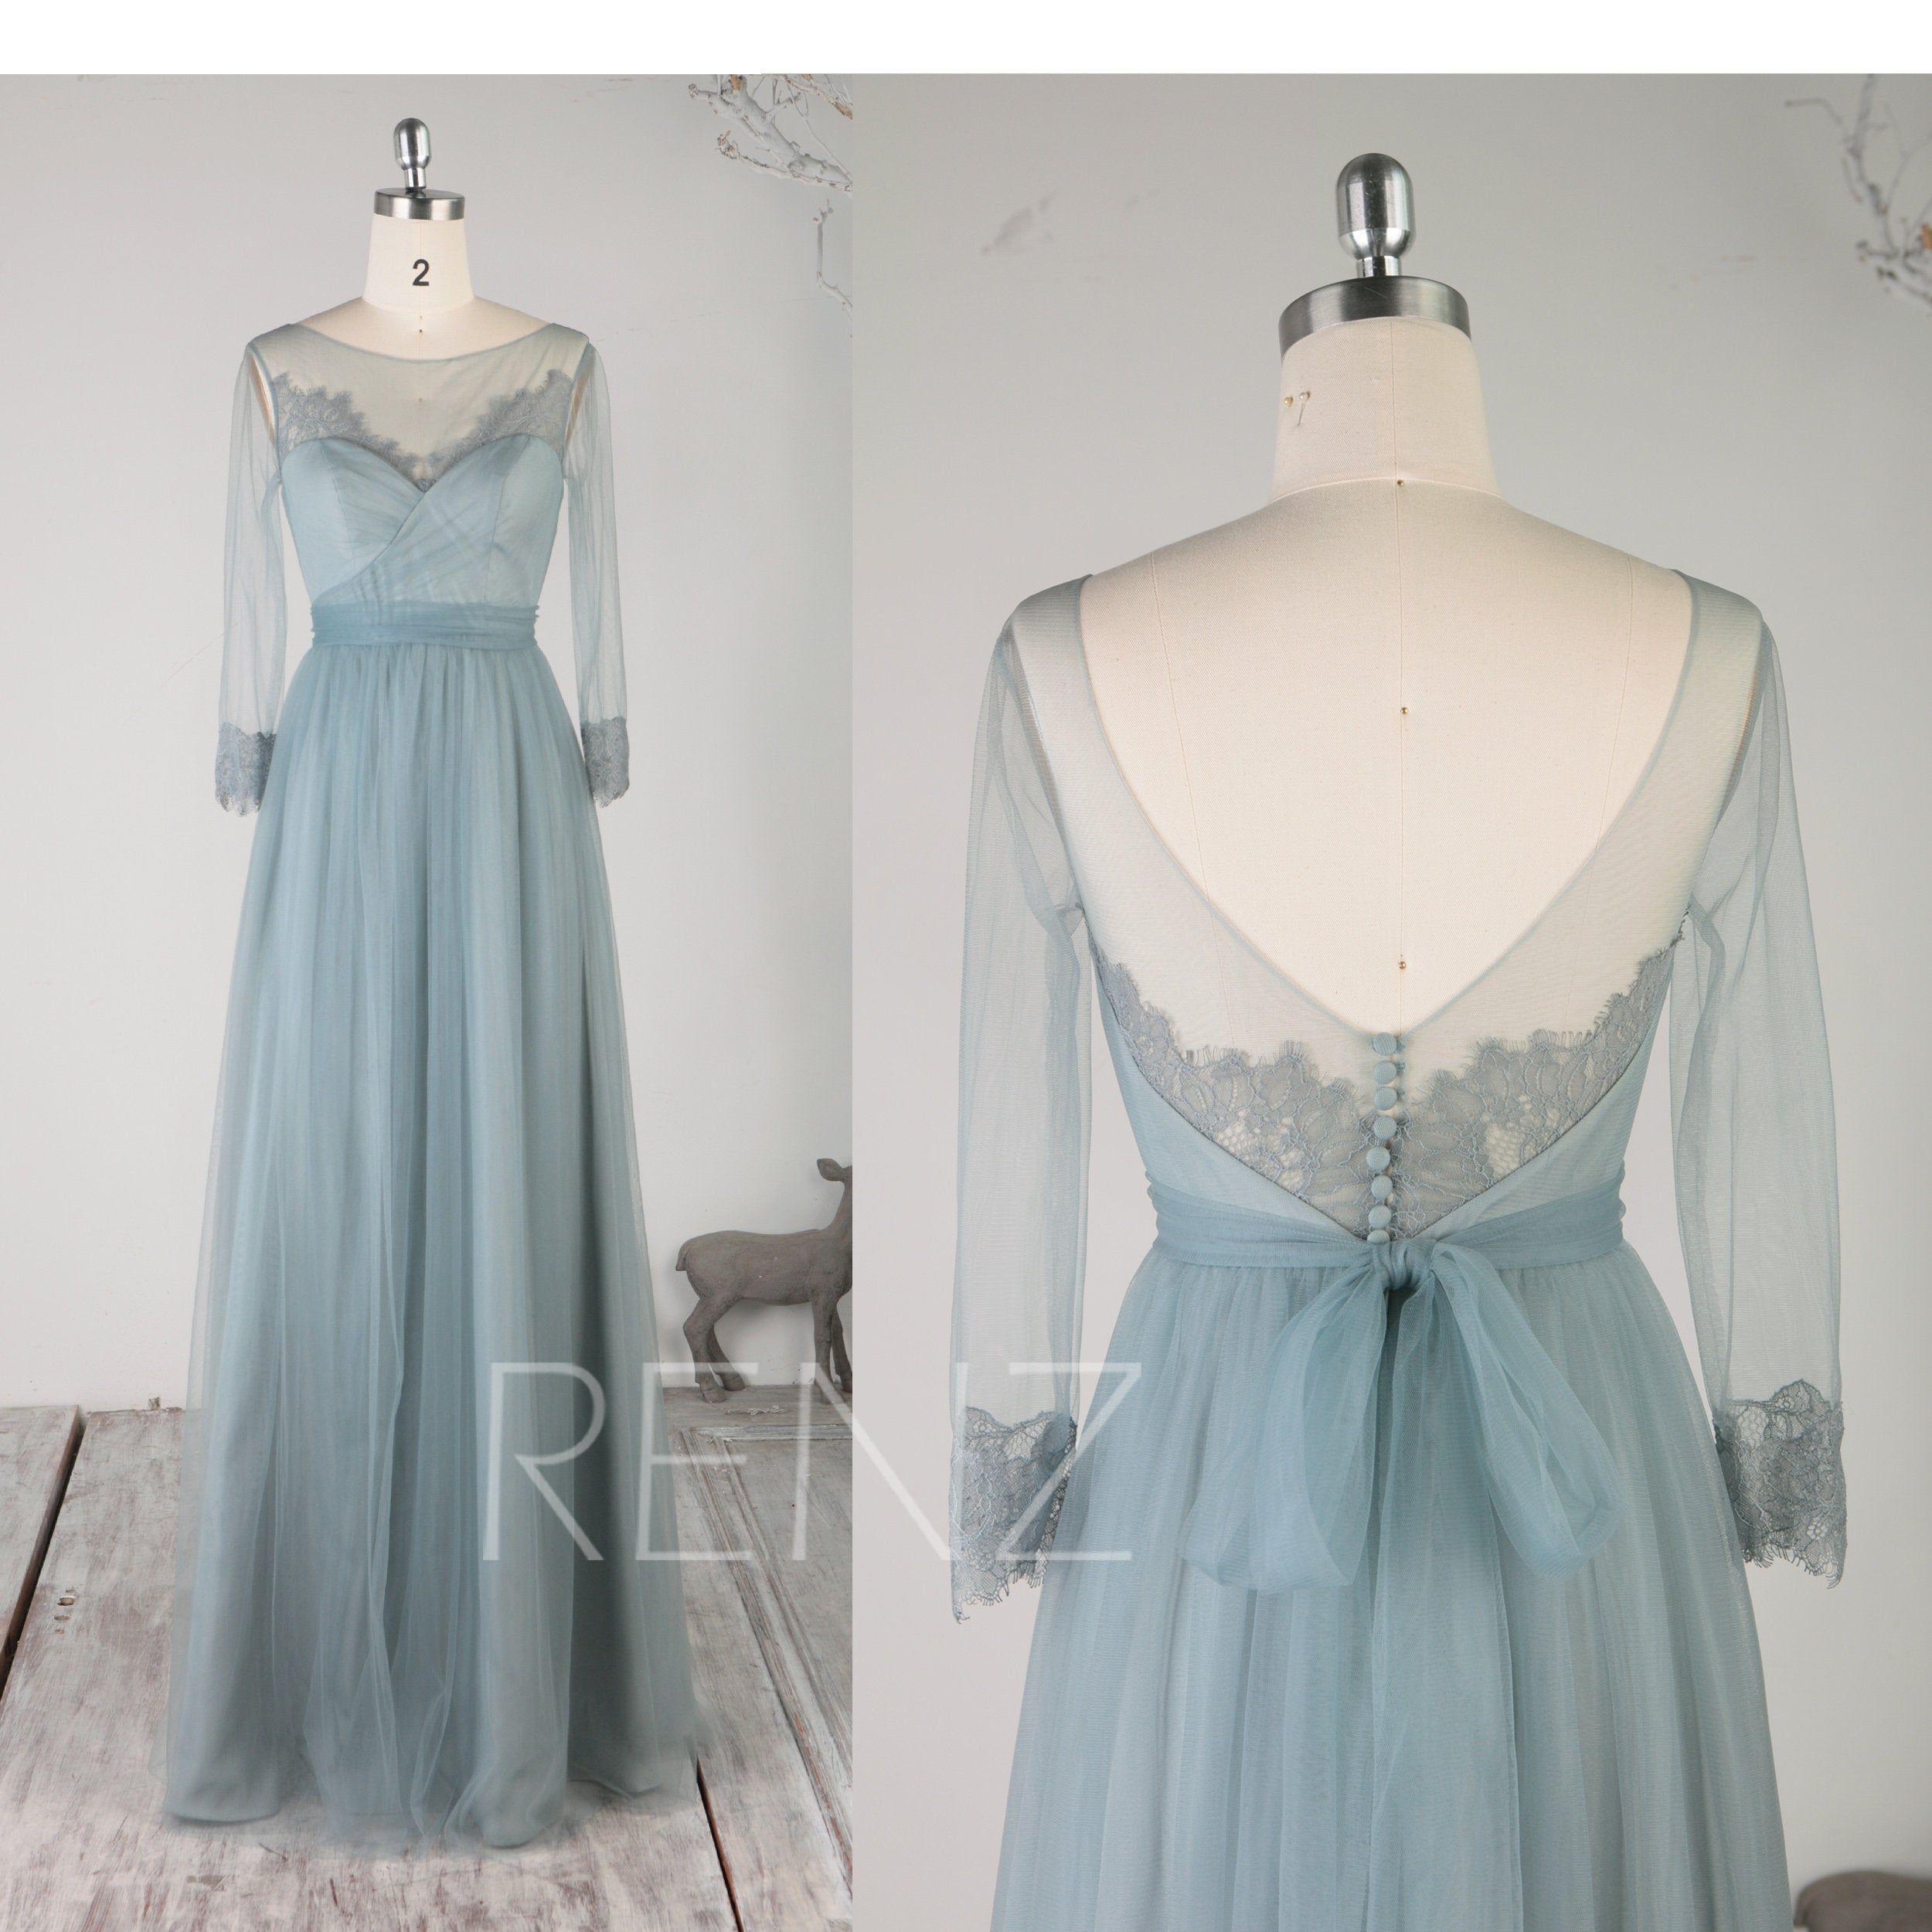 Bridesmaid Dress Dusty Blue Boho Wedding Dress Long Sleeves Prom Dress Lace Illusion Boat Neck Long Sash A Line Tulle Formal Dres Vestidos Largos Vestidos Boda [ 2500 x 2500 Pixel ]